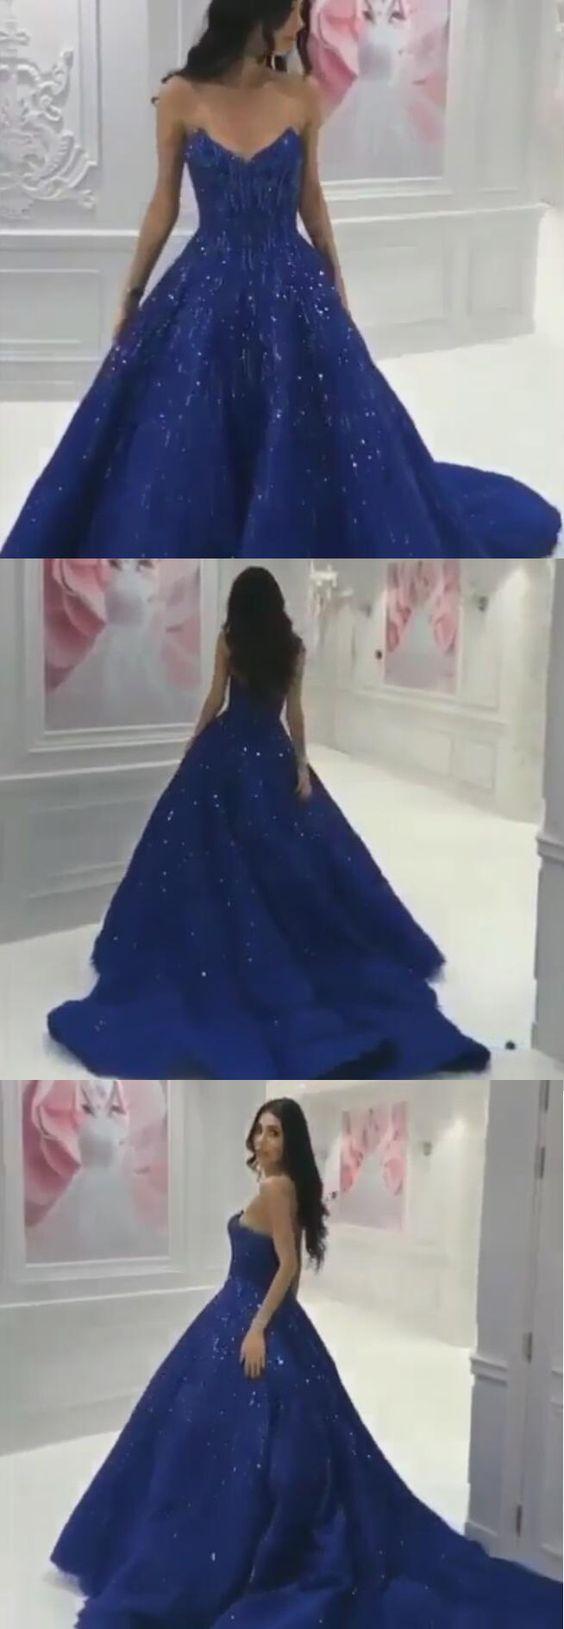 Royal blue prom dresses long prom dresses dresses things i need